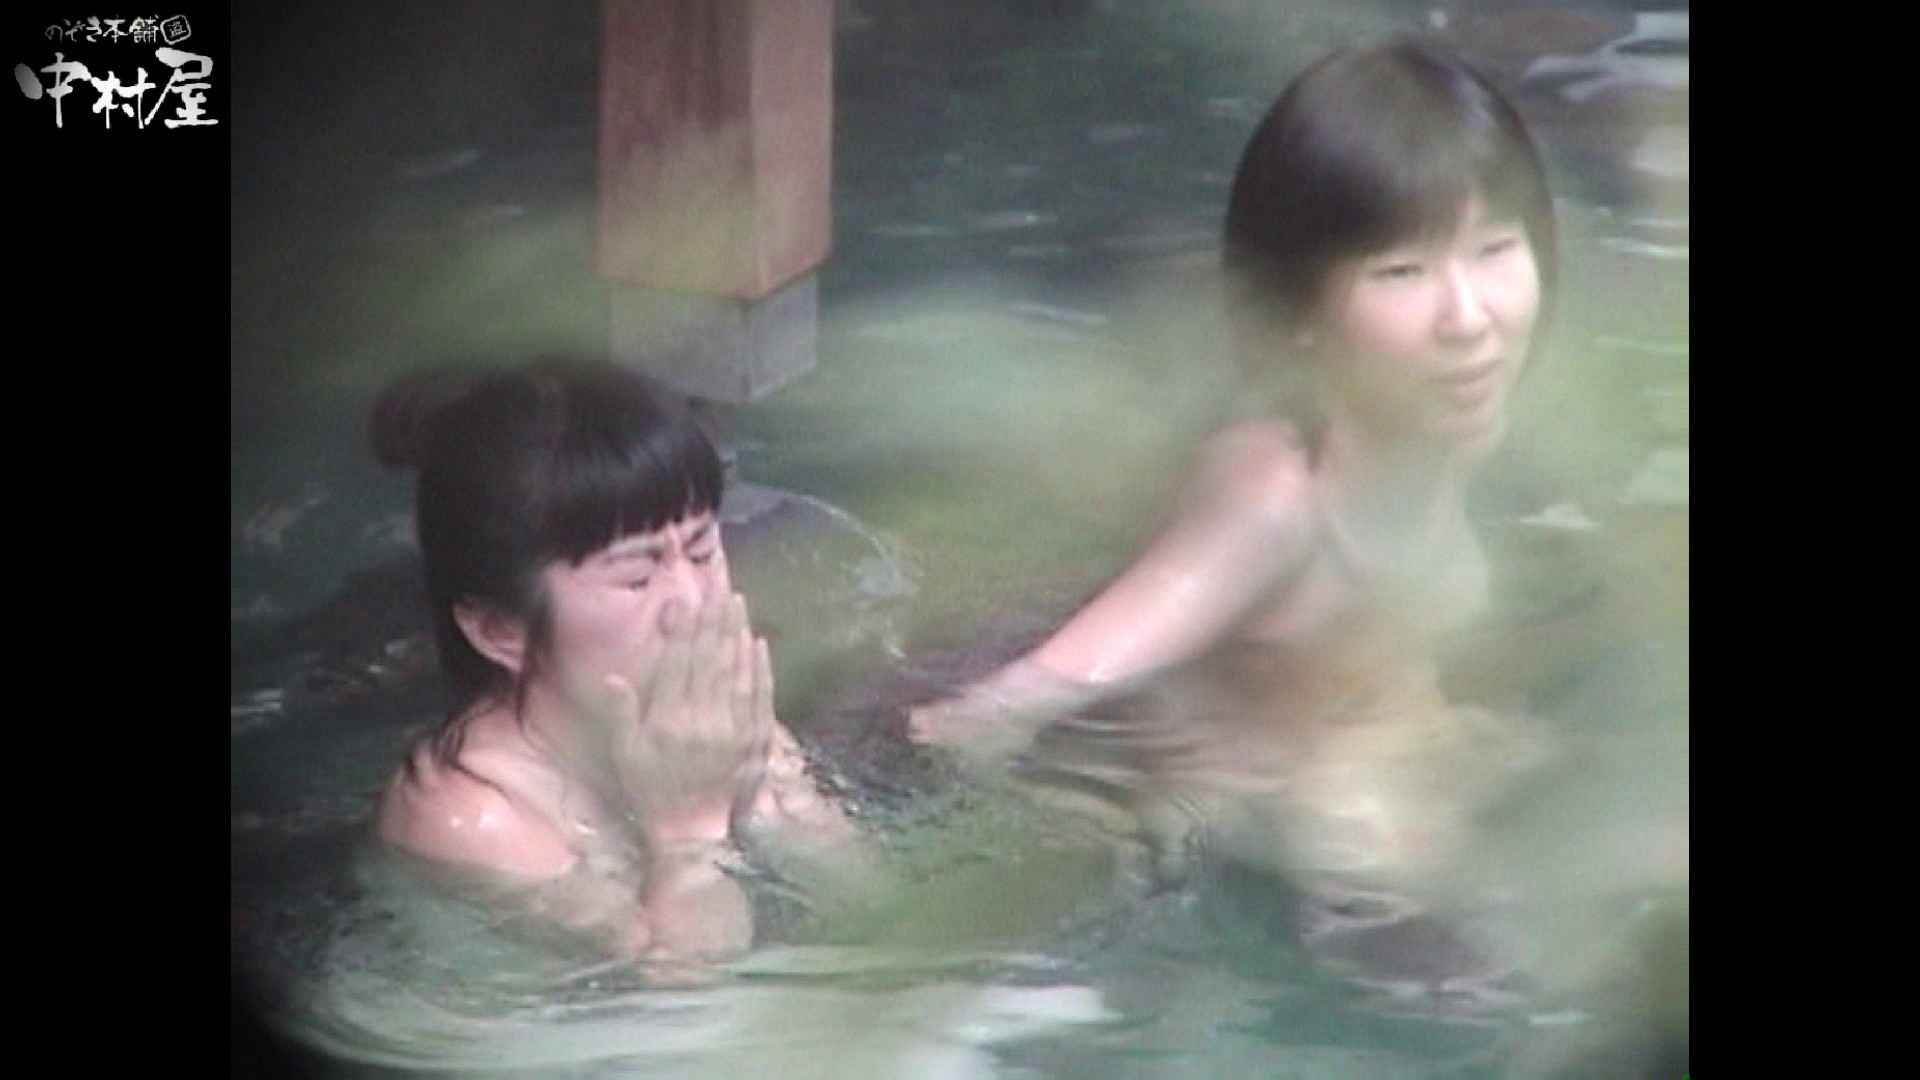 Aquaな露天風呂Vol.953 OLのエロ生活   露天風呂  107連発 79